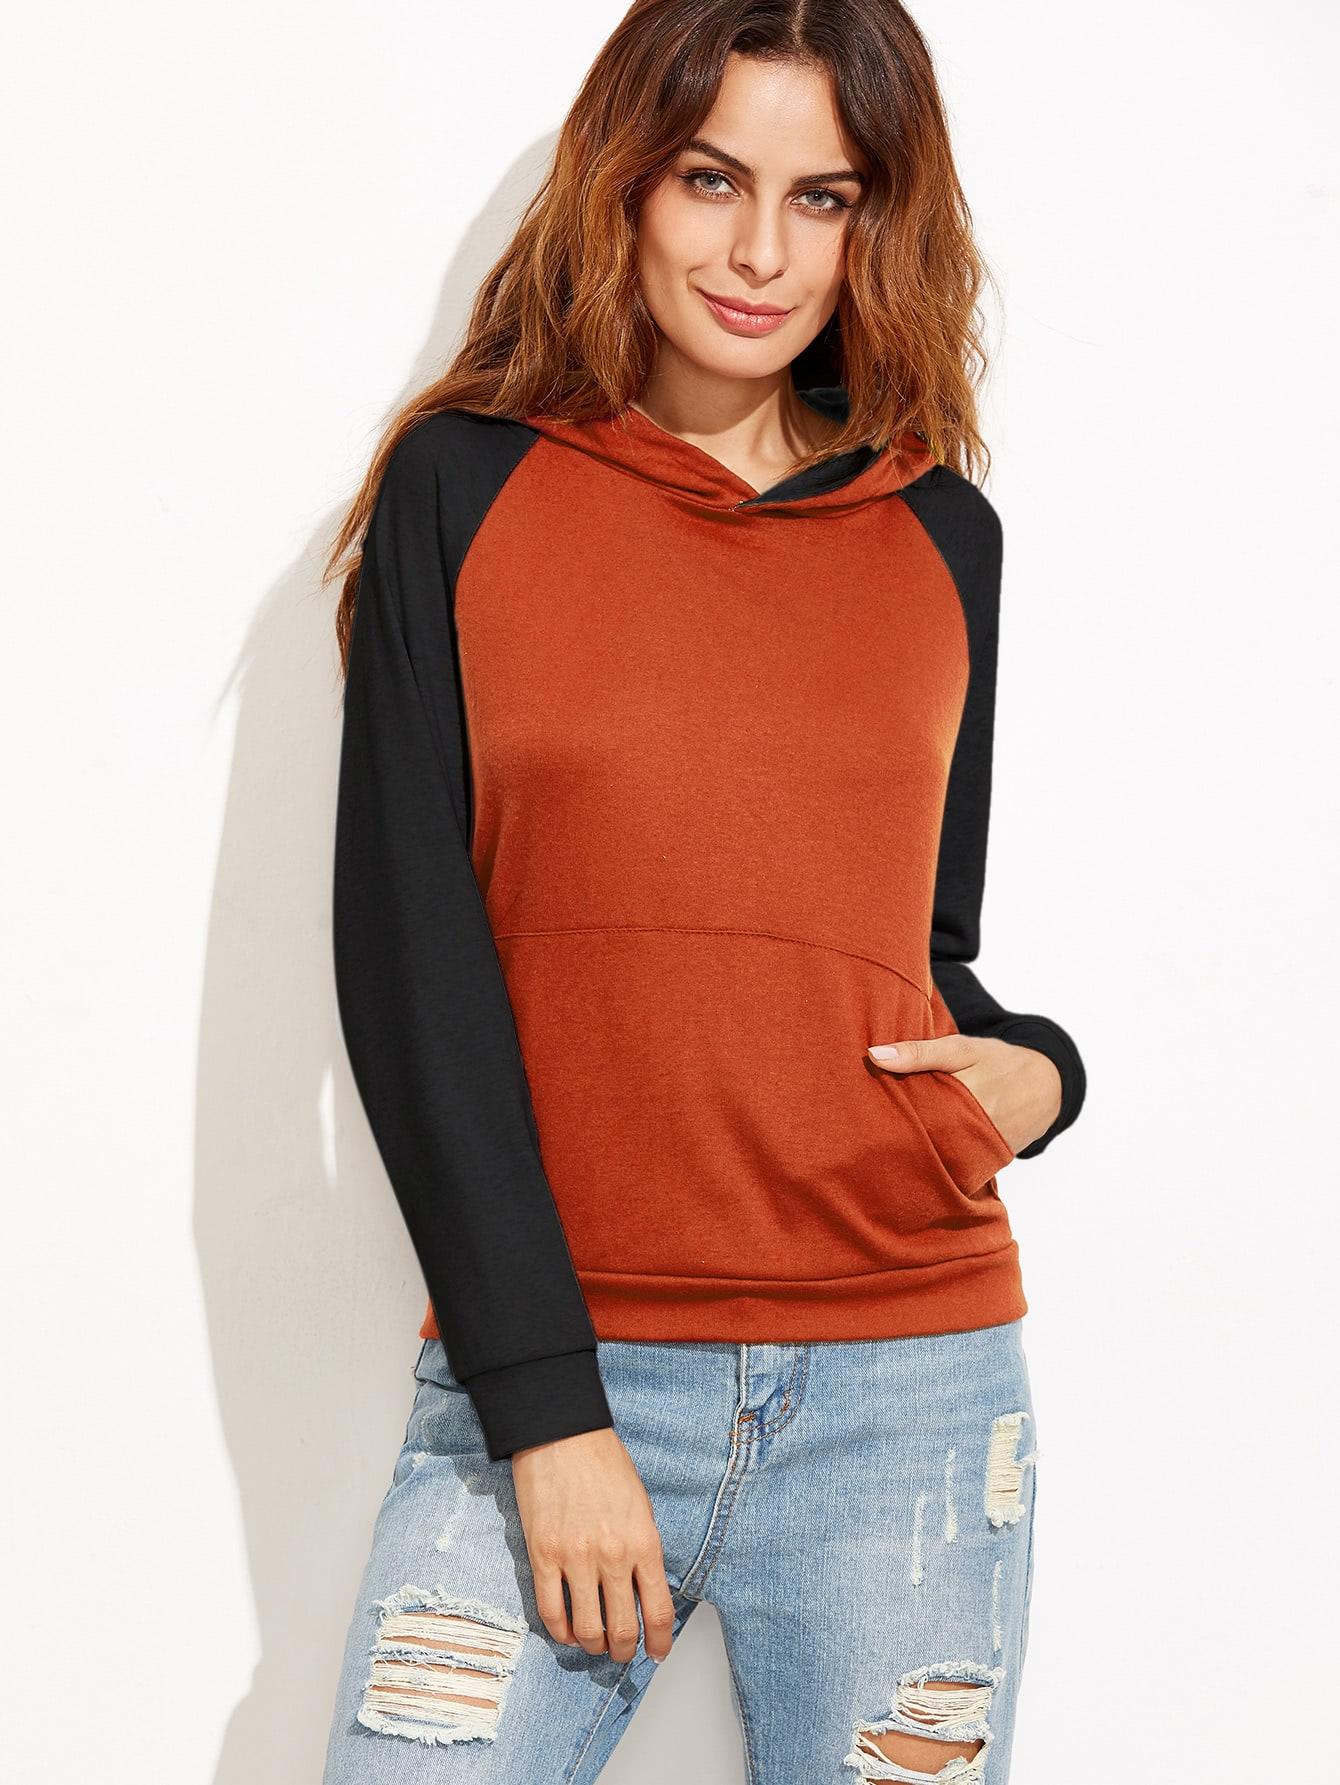 Contrast Raglan Sleeve Hooded Sweatshirt sweatshirt160908101